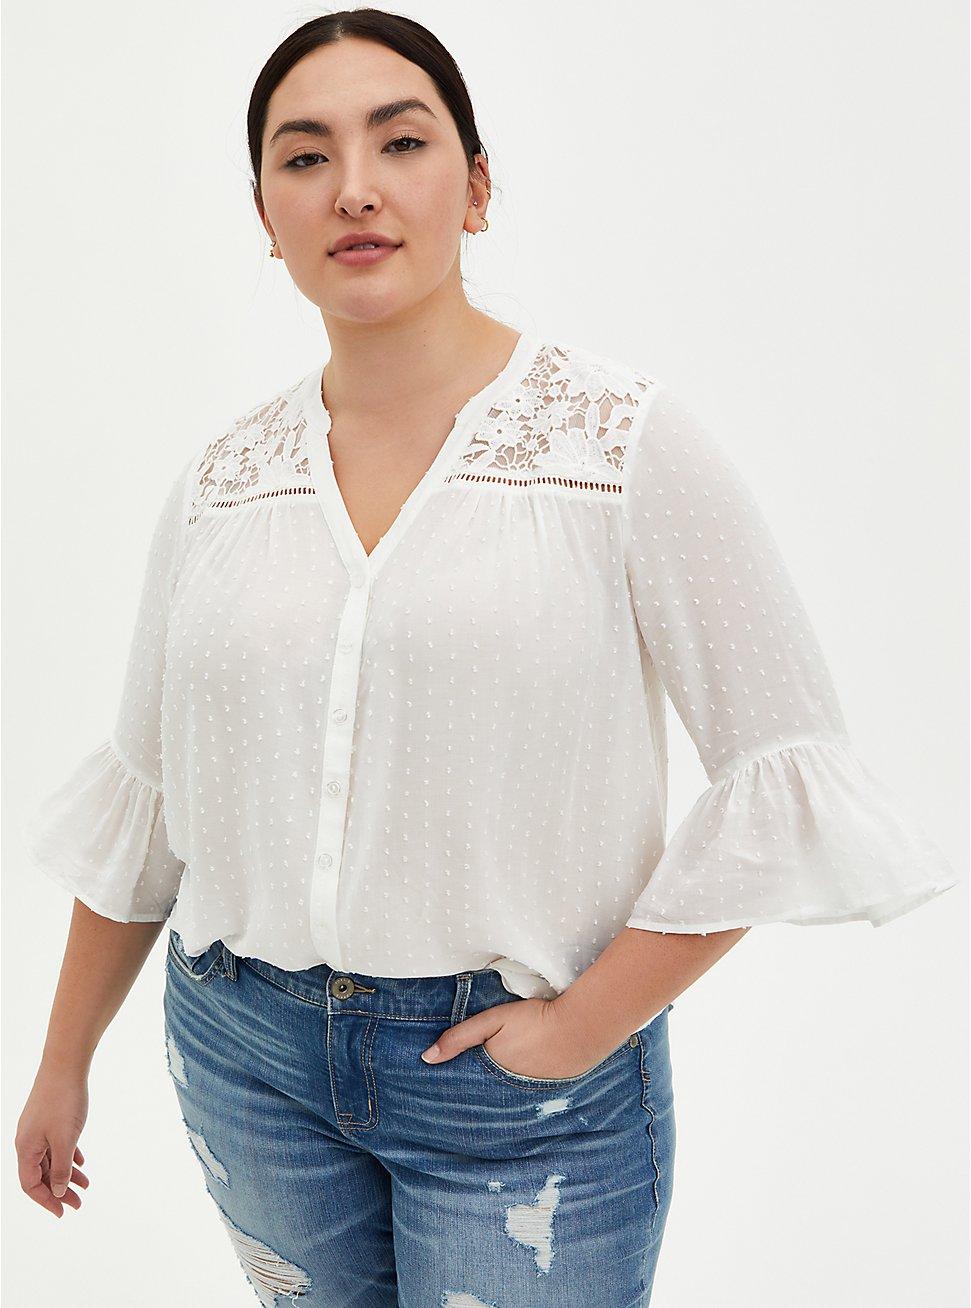 White Crochet Swiss Dot Blouse, CLOUD DANCER, hi-res